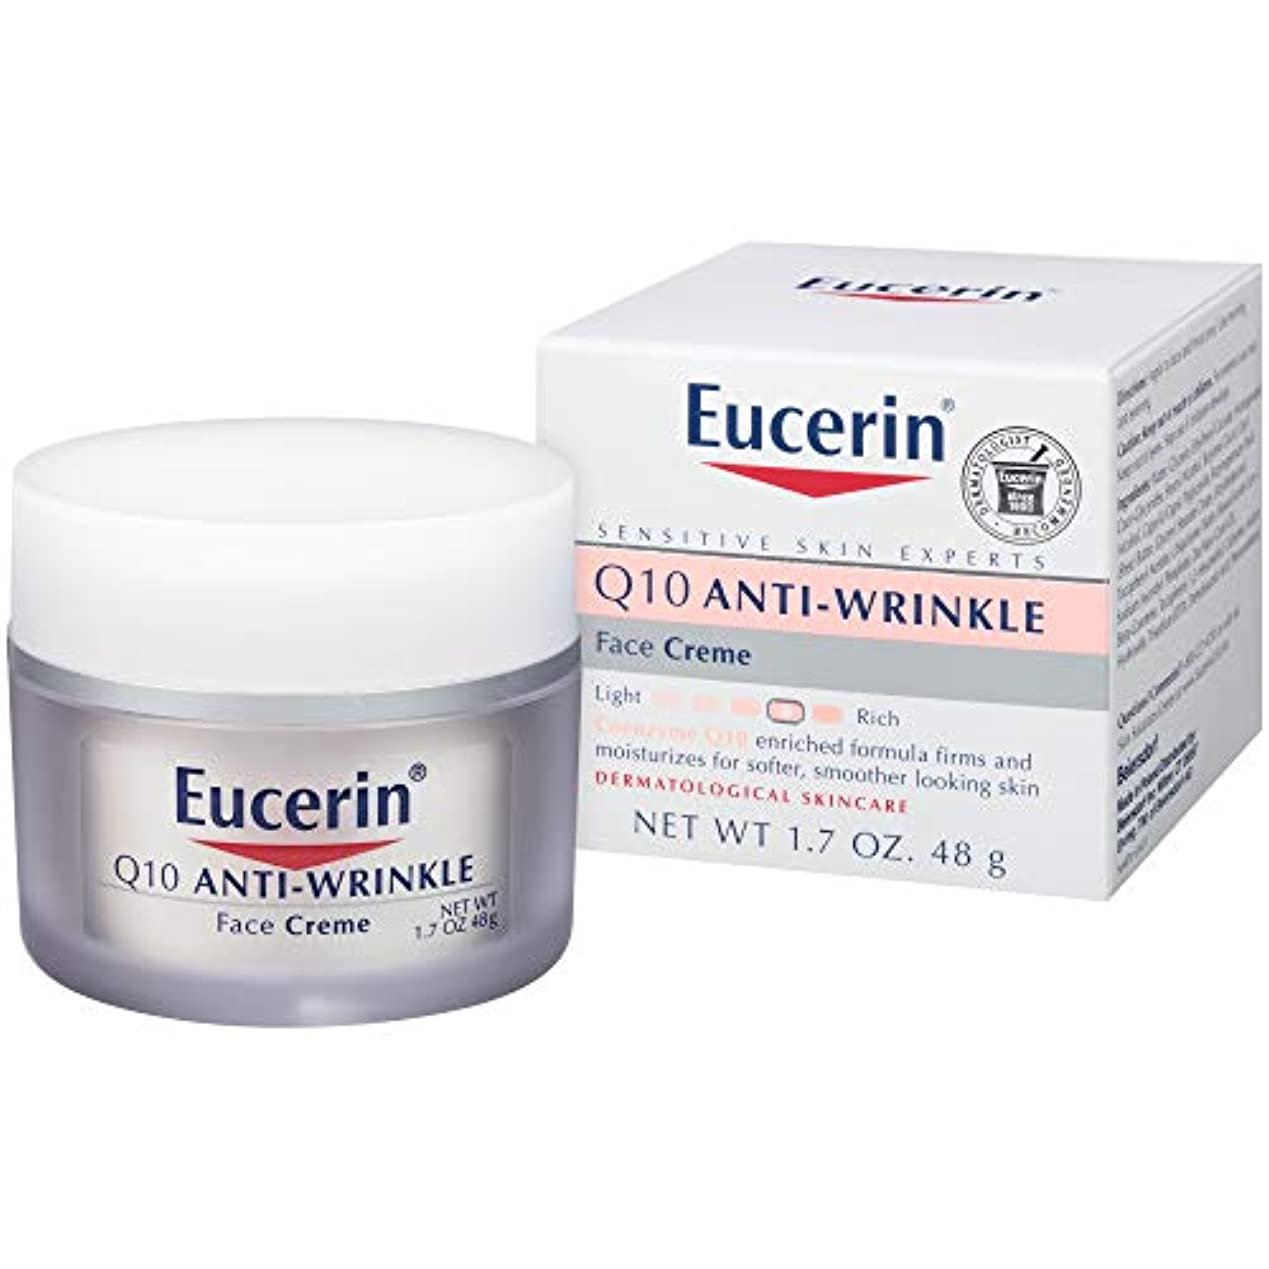 間隔骨骨Eucerin Sensitive Facial Skin Q10 Anti-Wrinkle Sensitive Skin Creme 48g (並行輸入品)